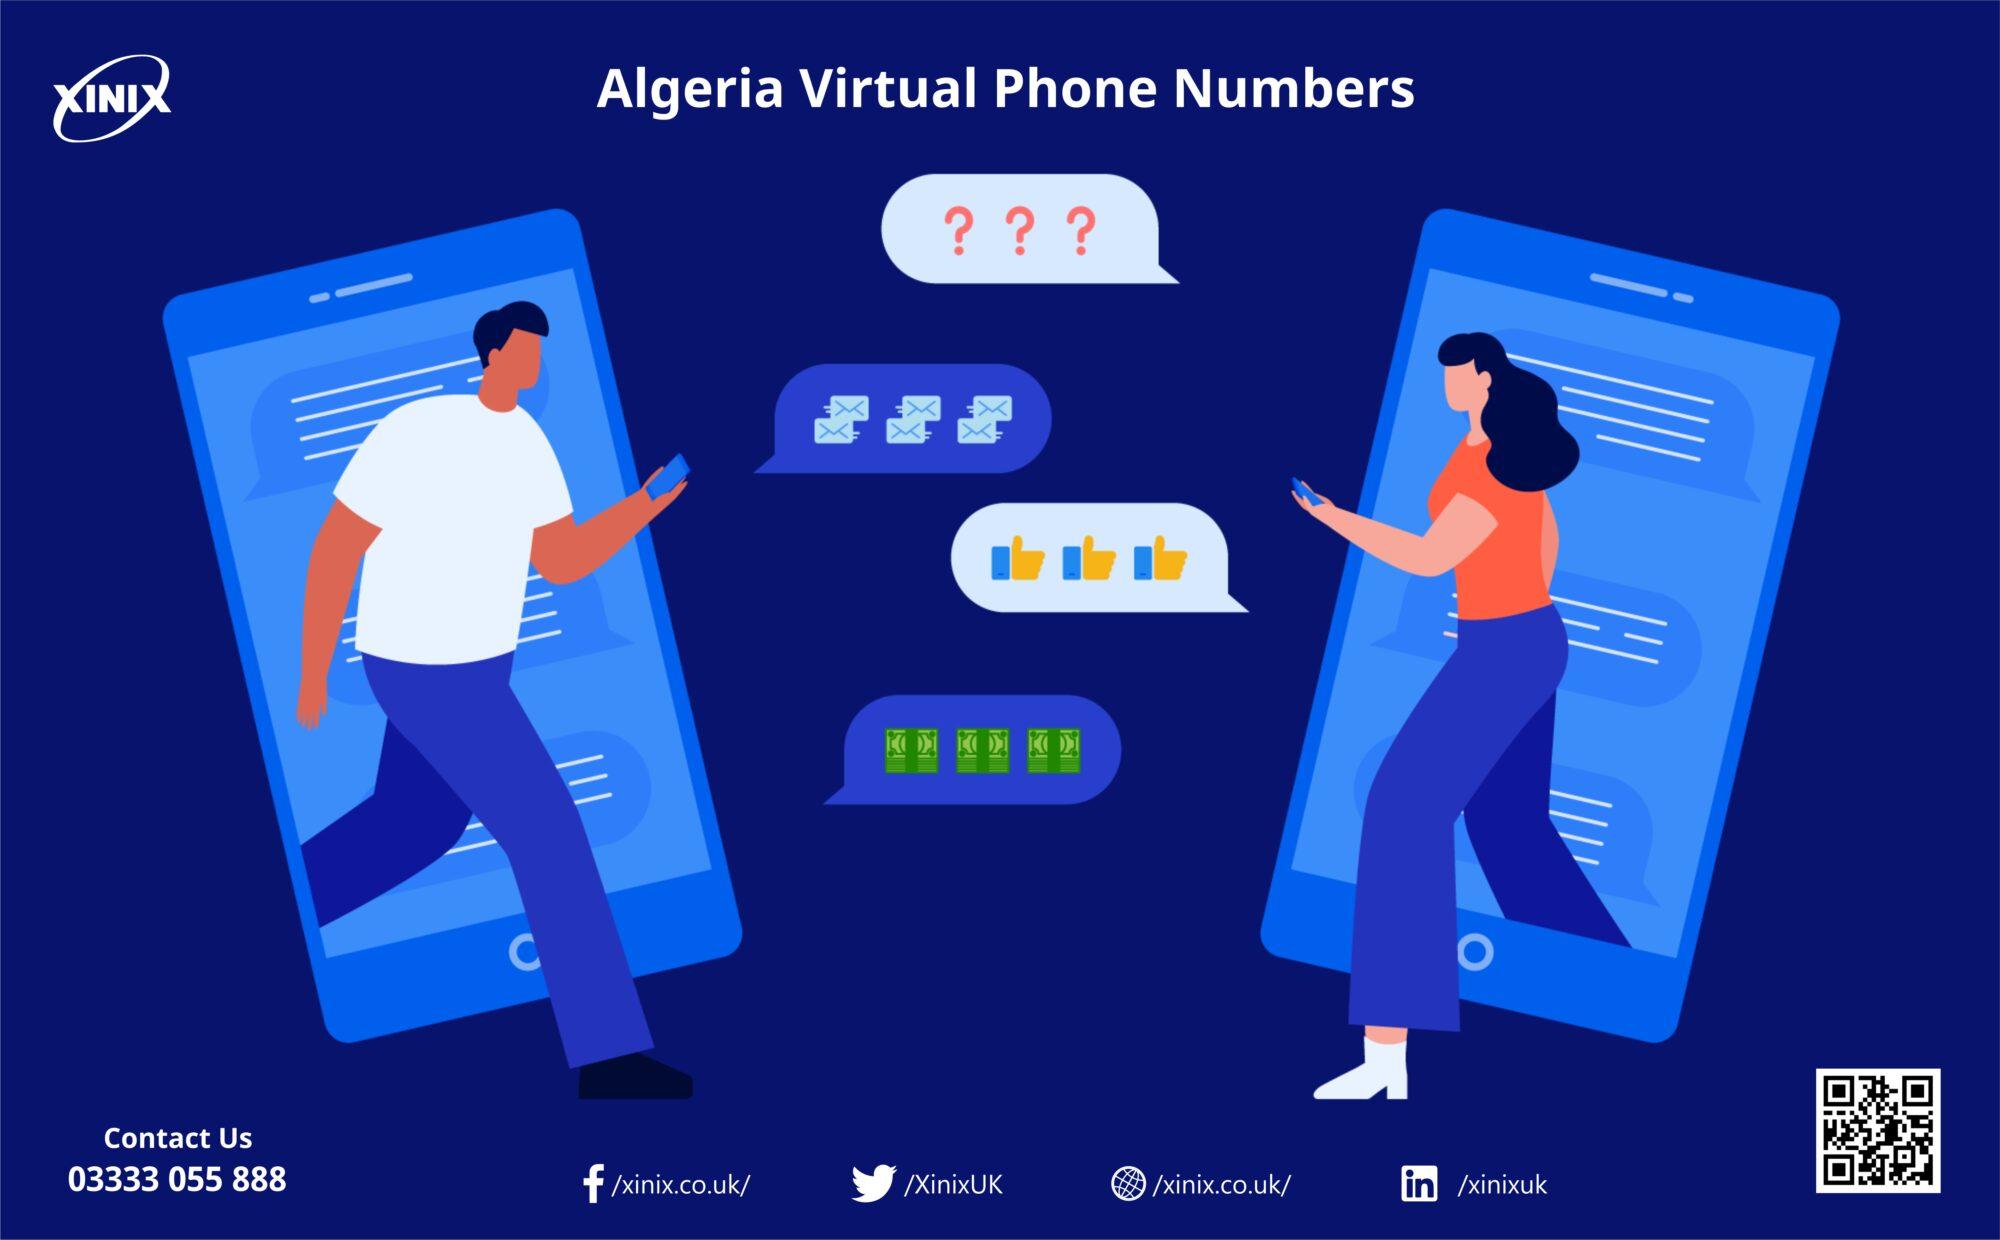 Algeria Virtual Phone Numbers